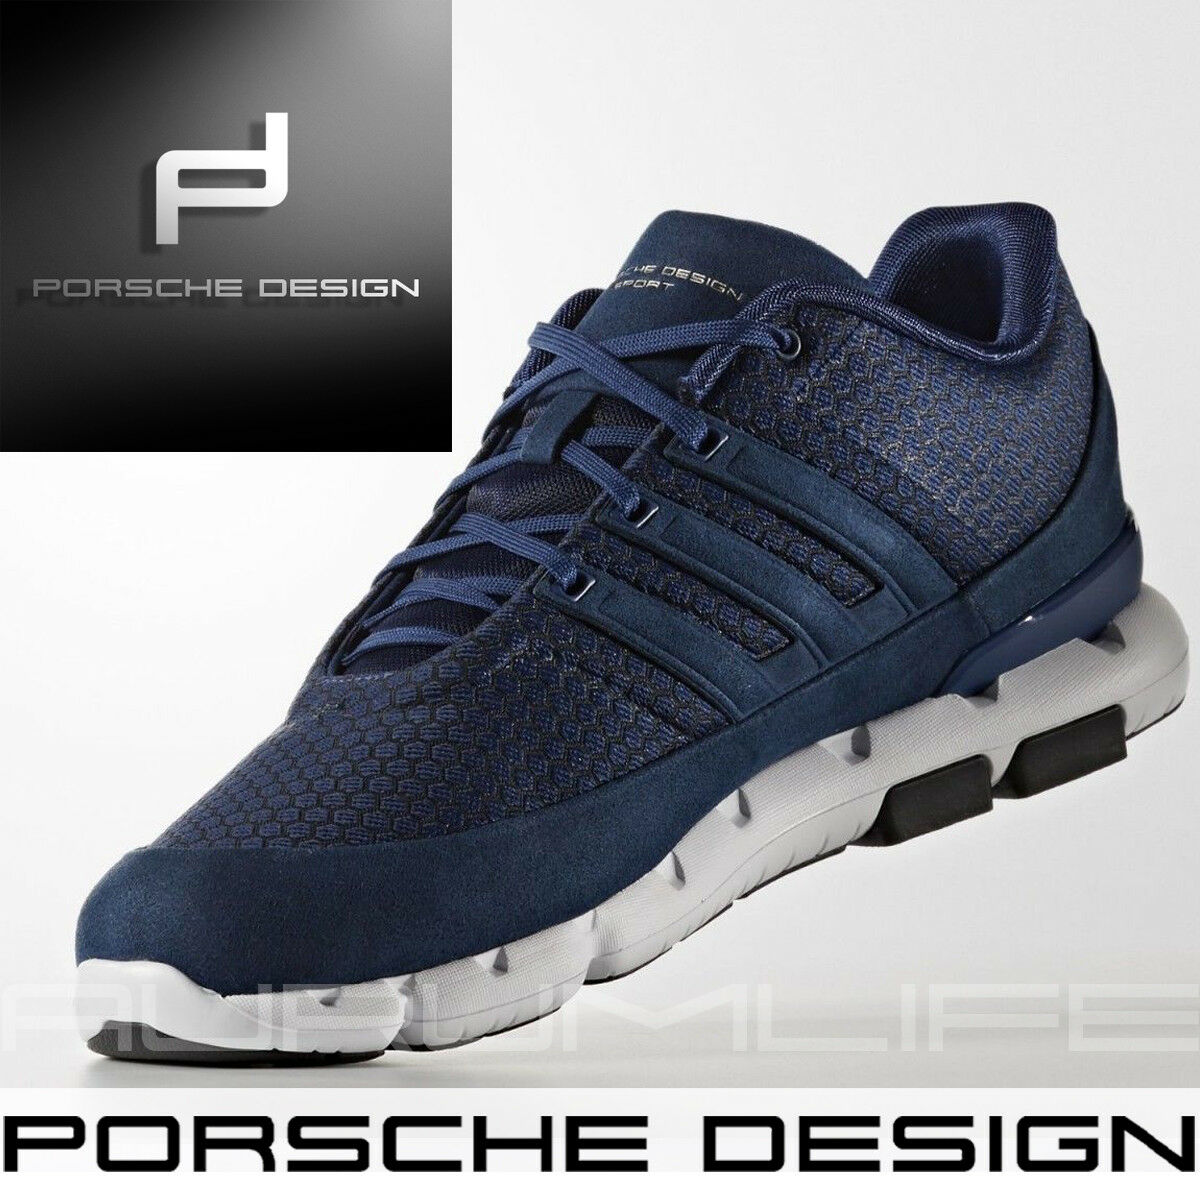 super popular 4a15b a24ee Adidas Adidas Adidas Porsche Design shoes Boost EC Running Bounce Mens Run  bluee Limited BB5529 dda5ae